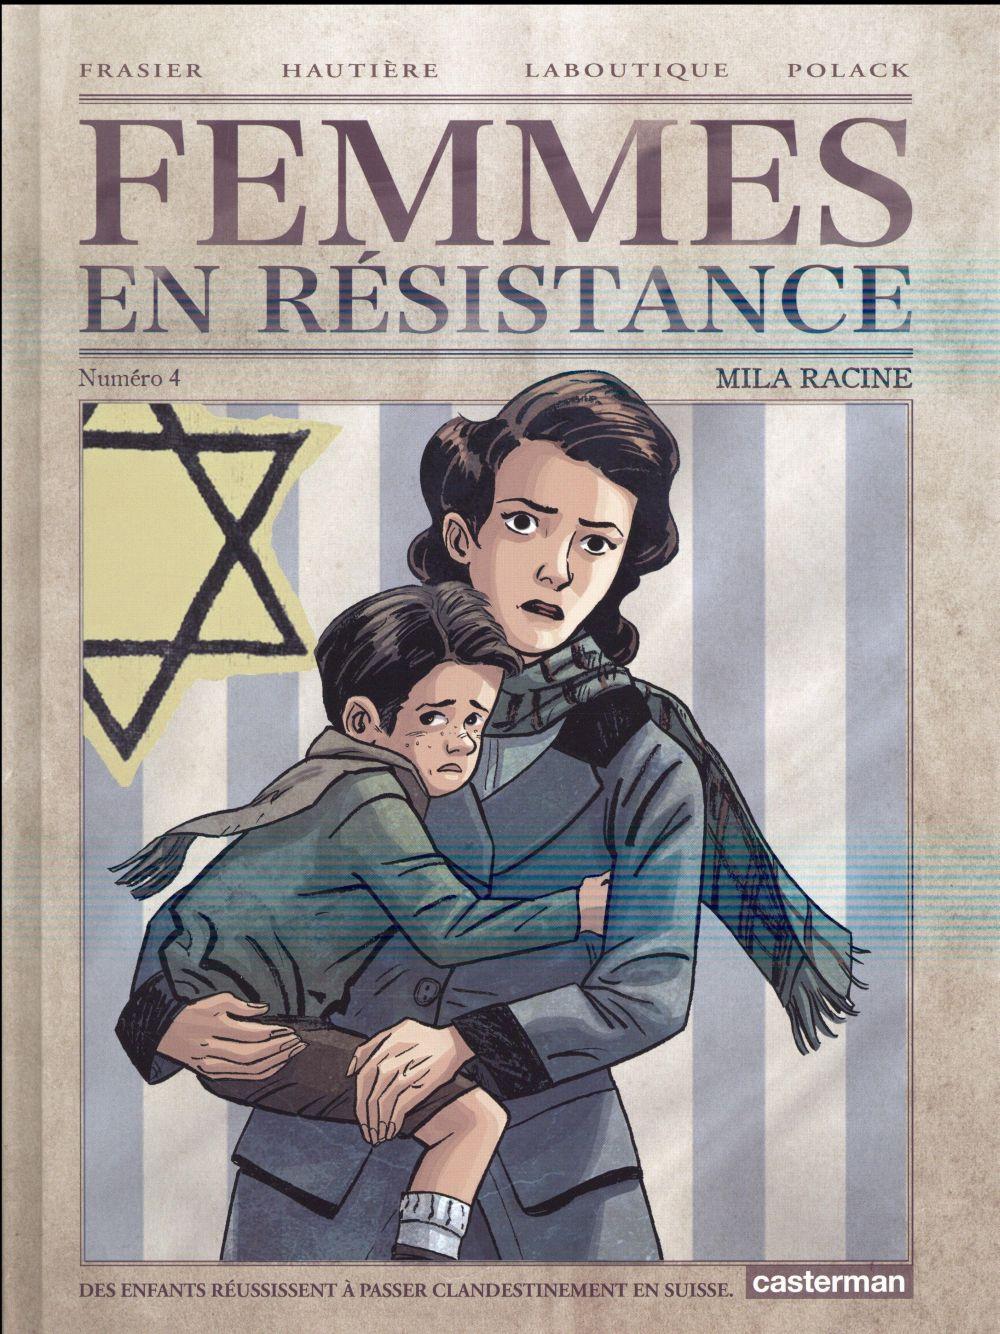 FEMMES EN RESISTANCE - T04 - MILA RACINE